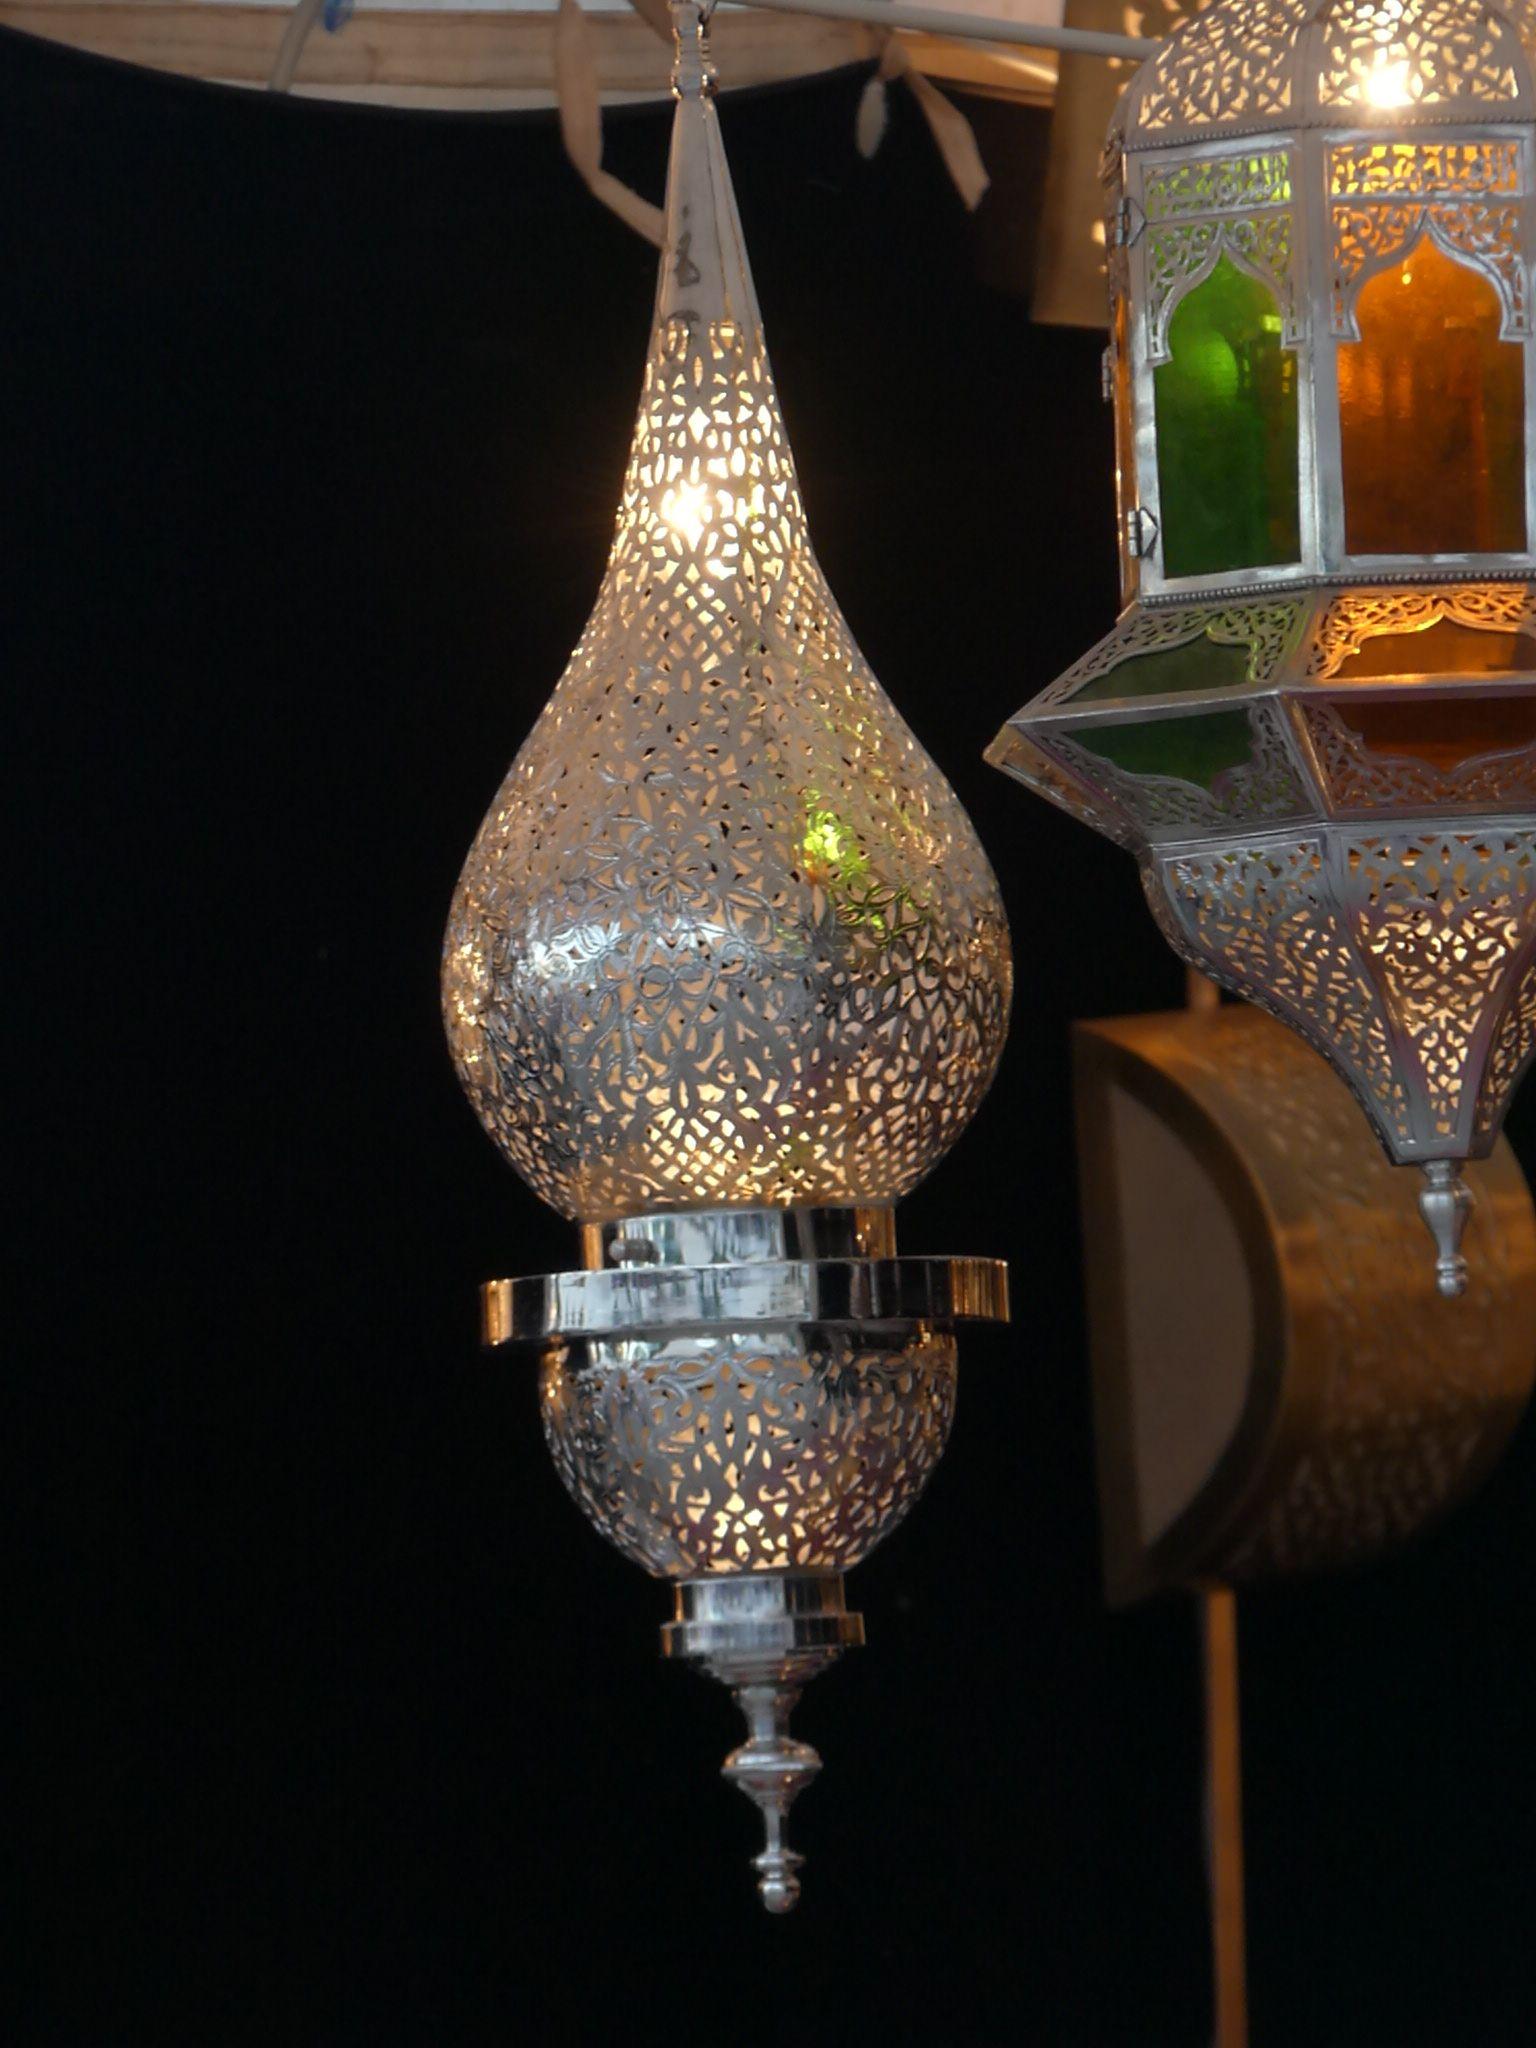 This Fancy Moorish Lighting Pendant Will Spread A Joyful